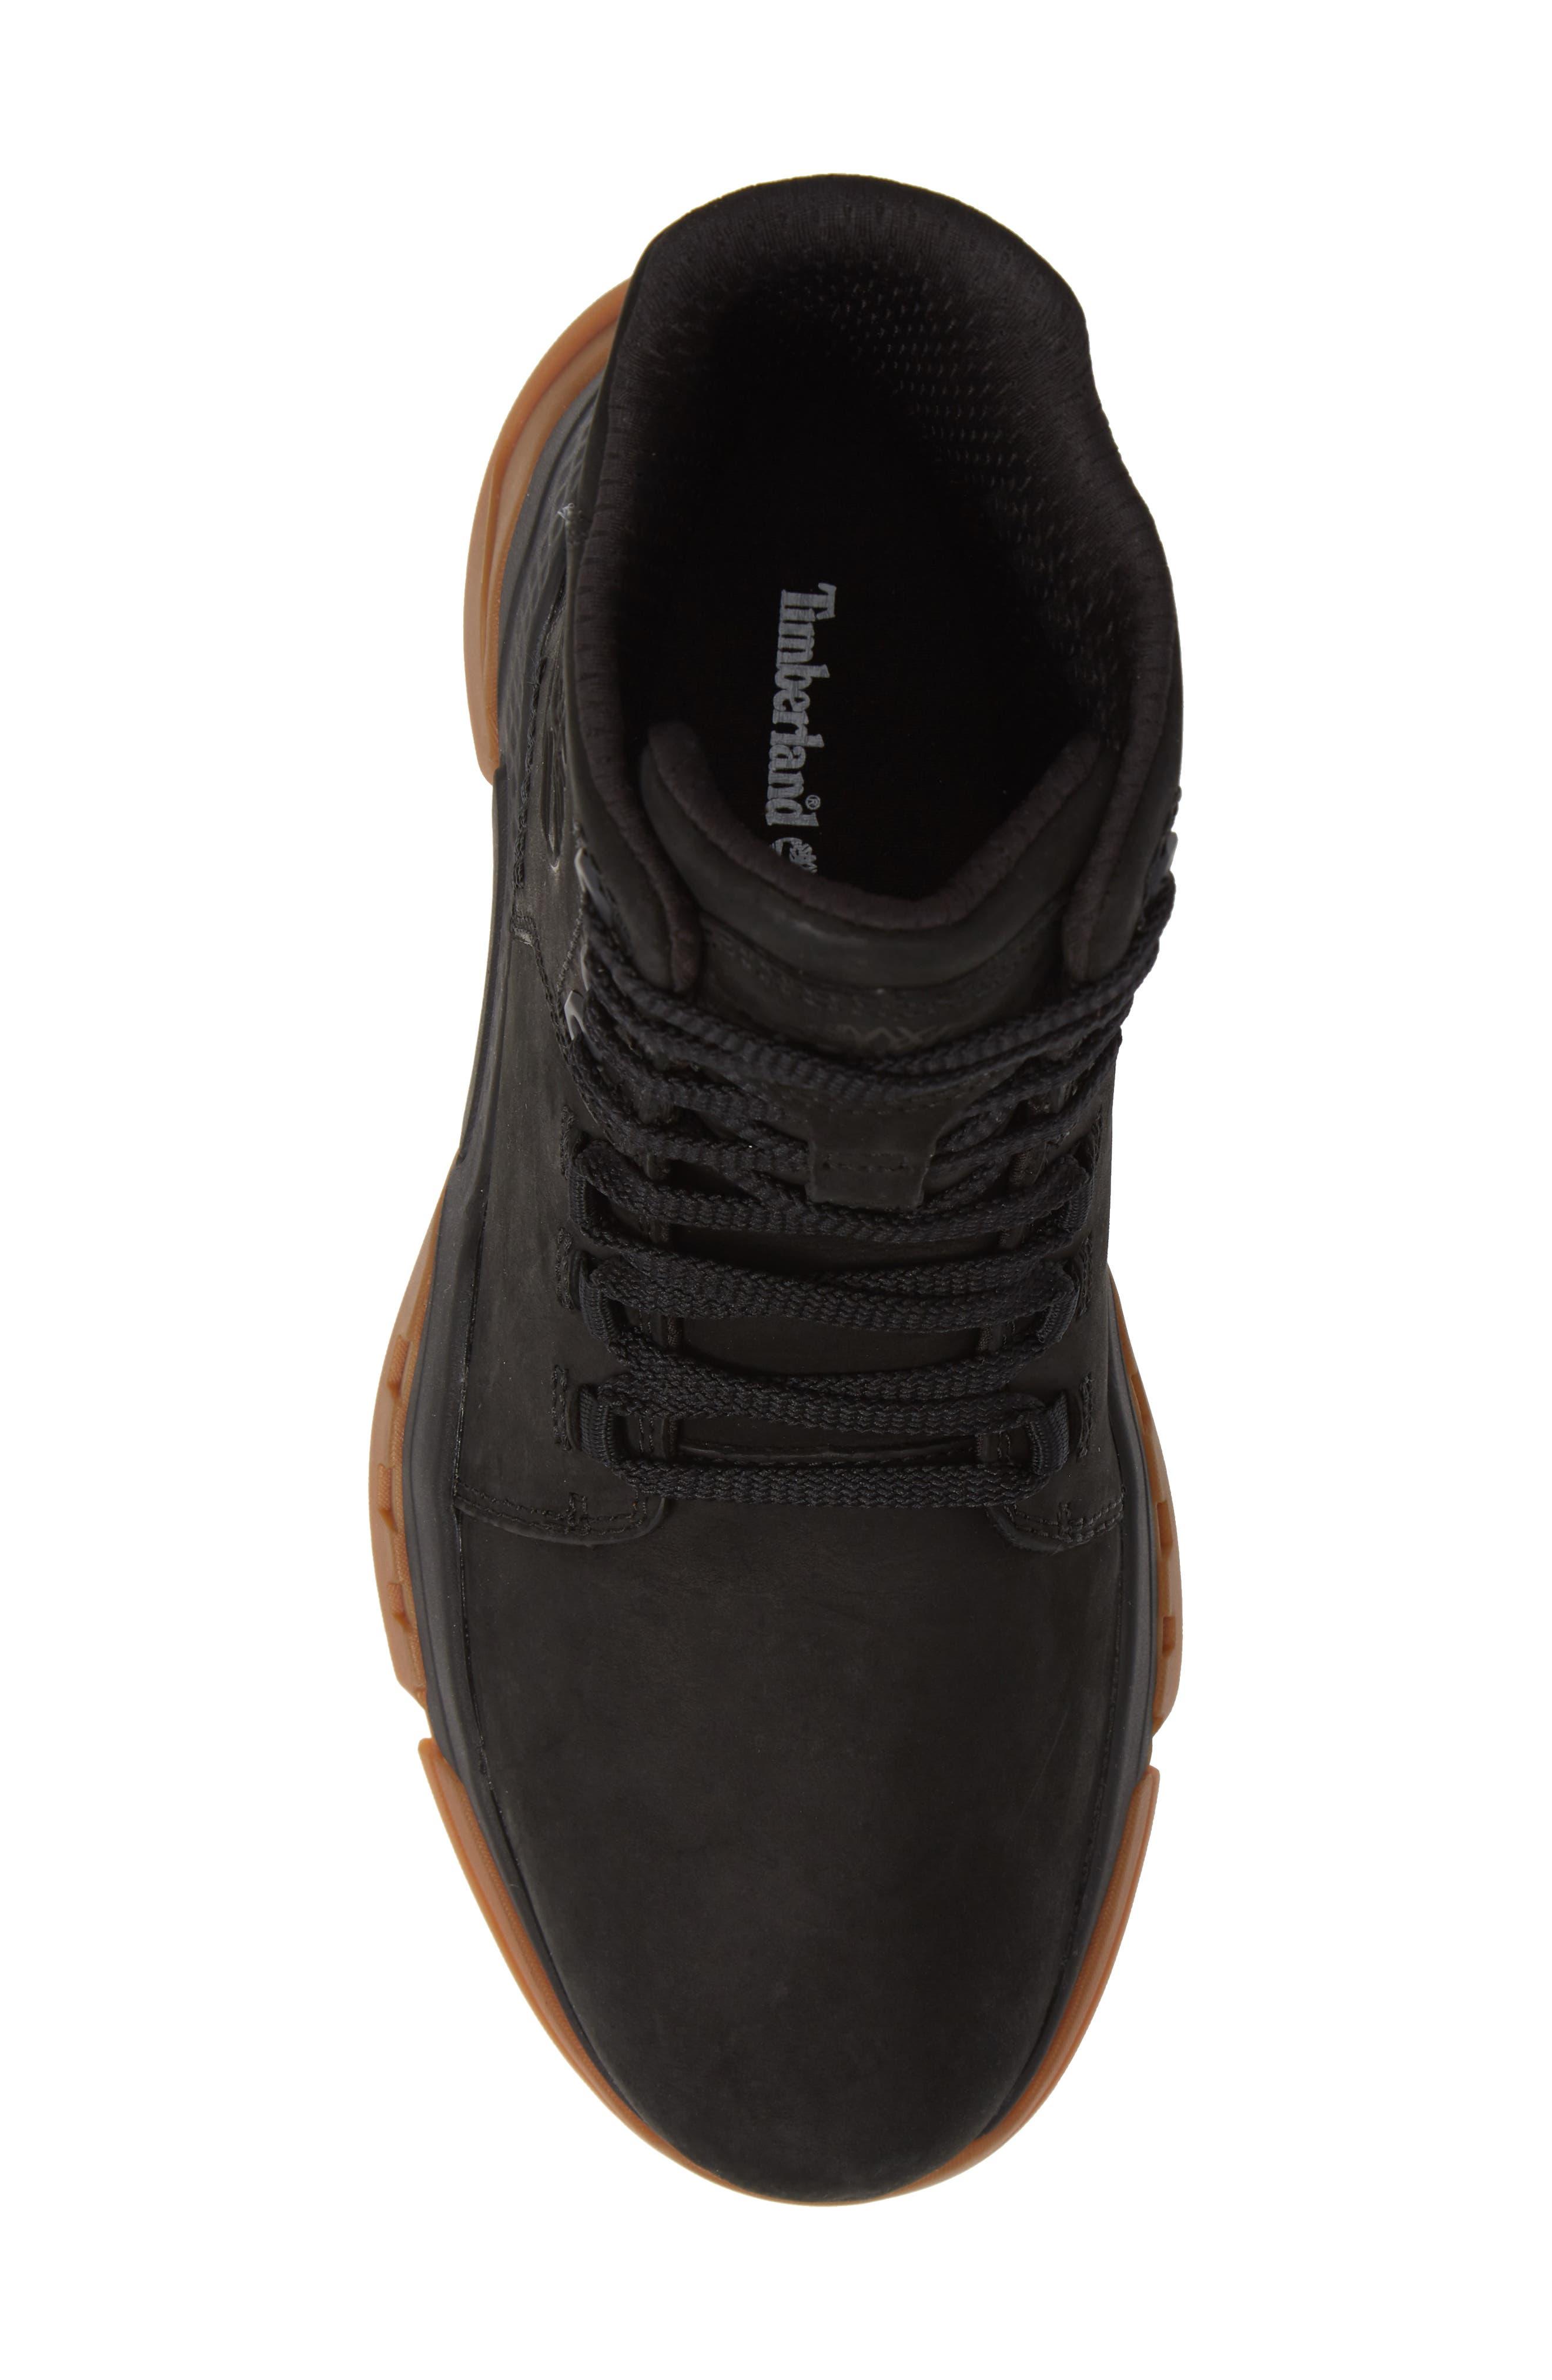 City Force Reveal Plain Toe Boot,                             Alternate thumbnail 5, color,                             BLACK LEATHER/ NEOPRENE